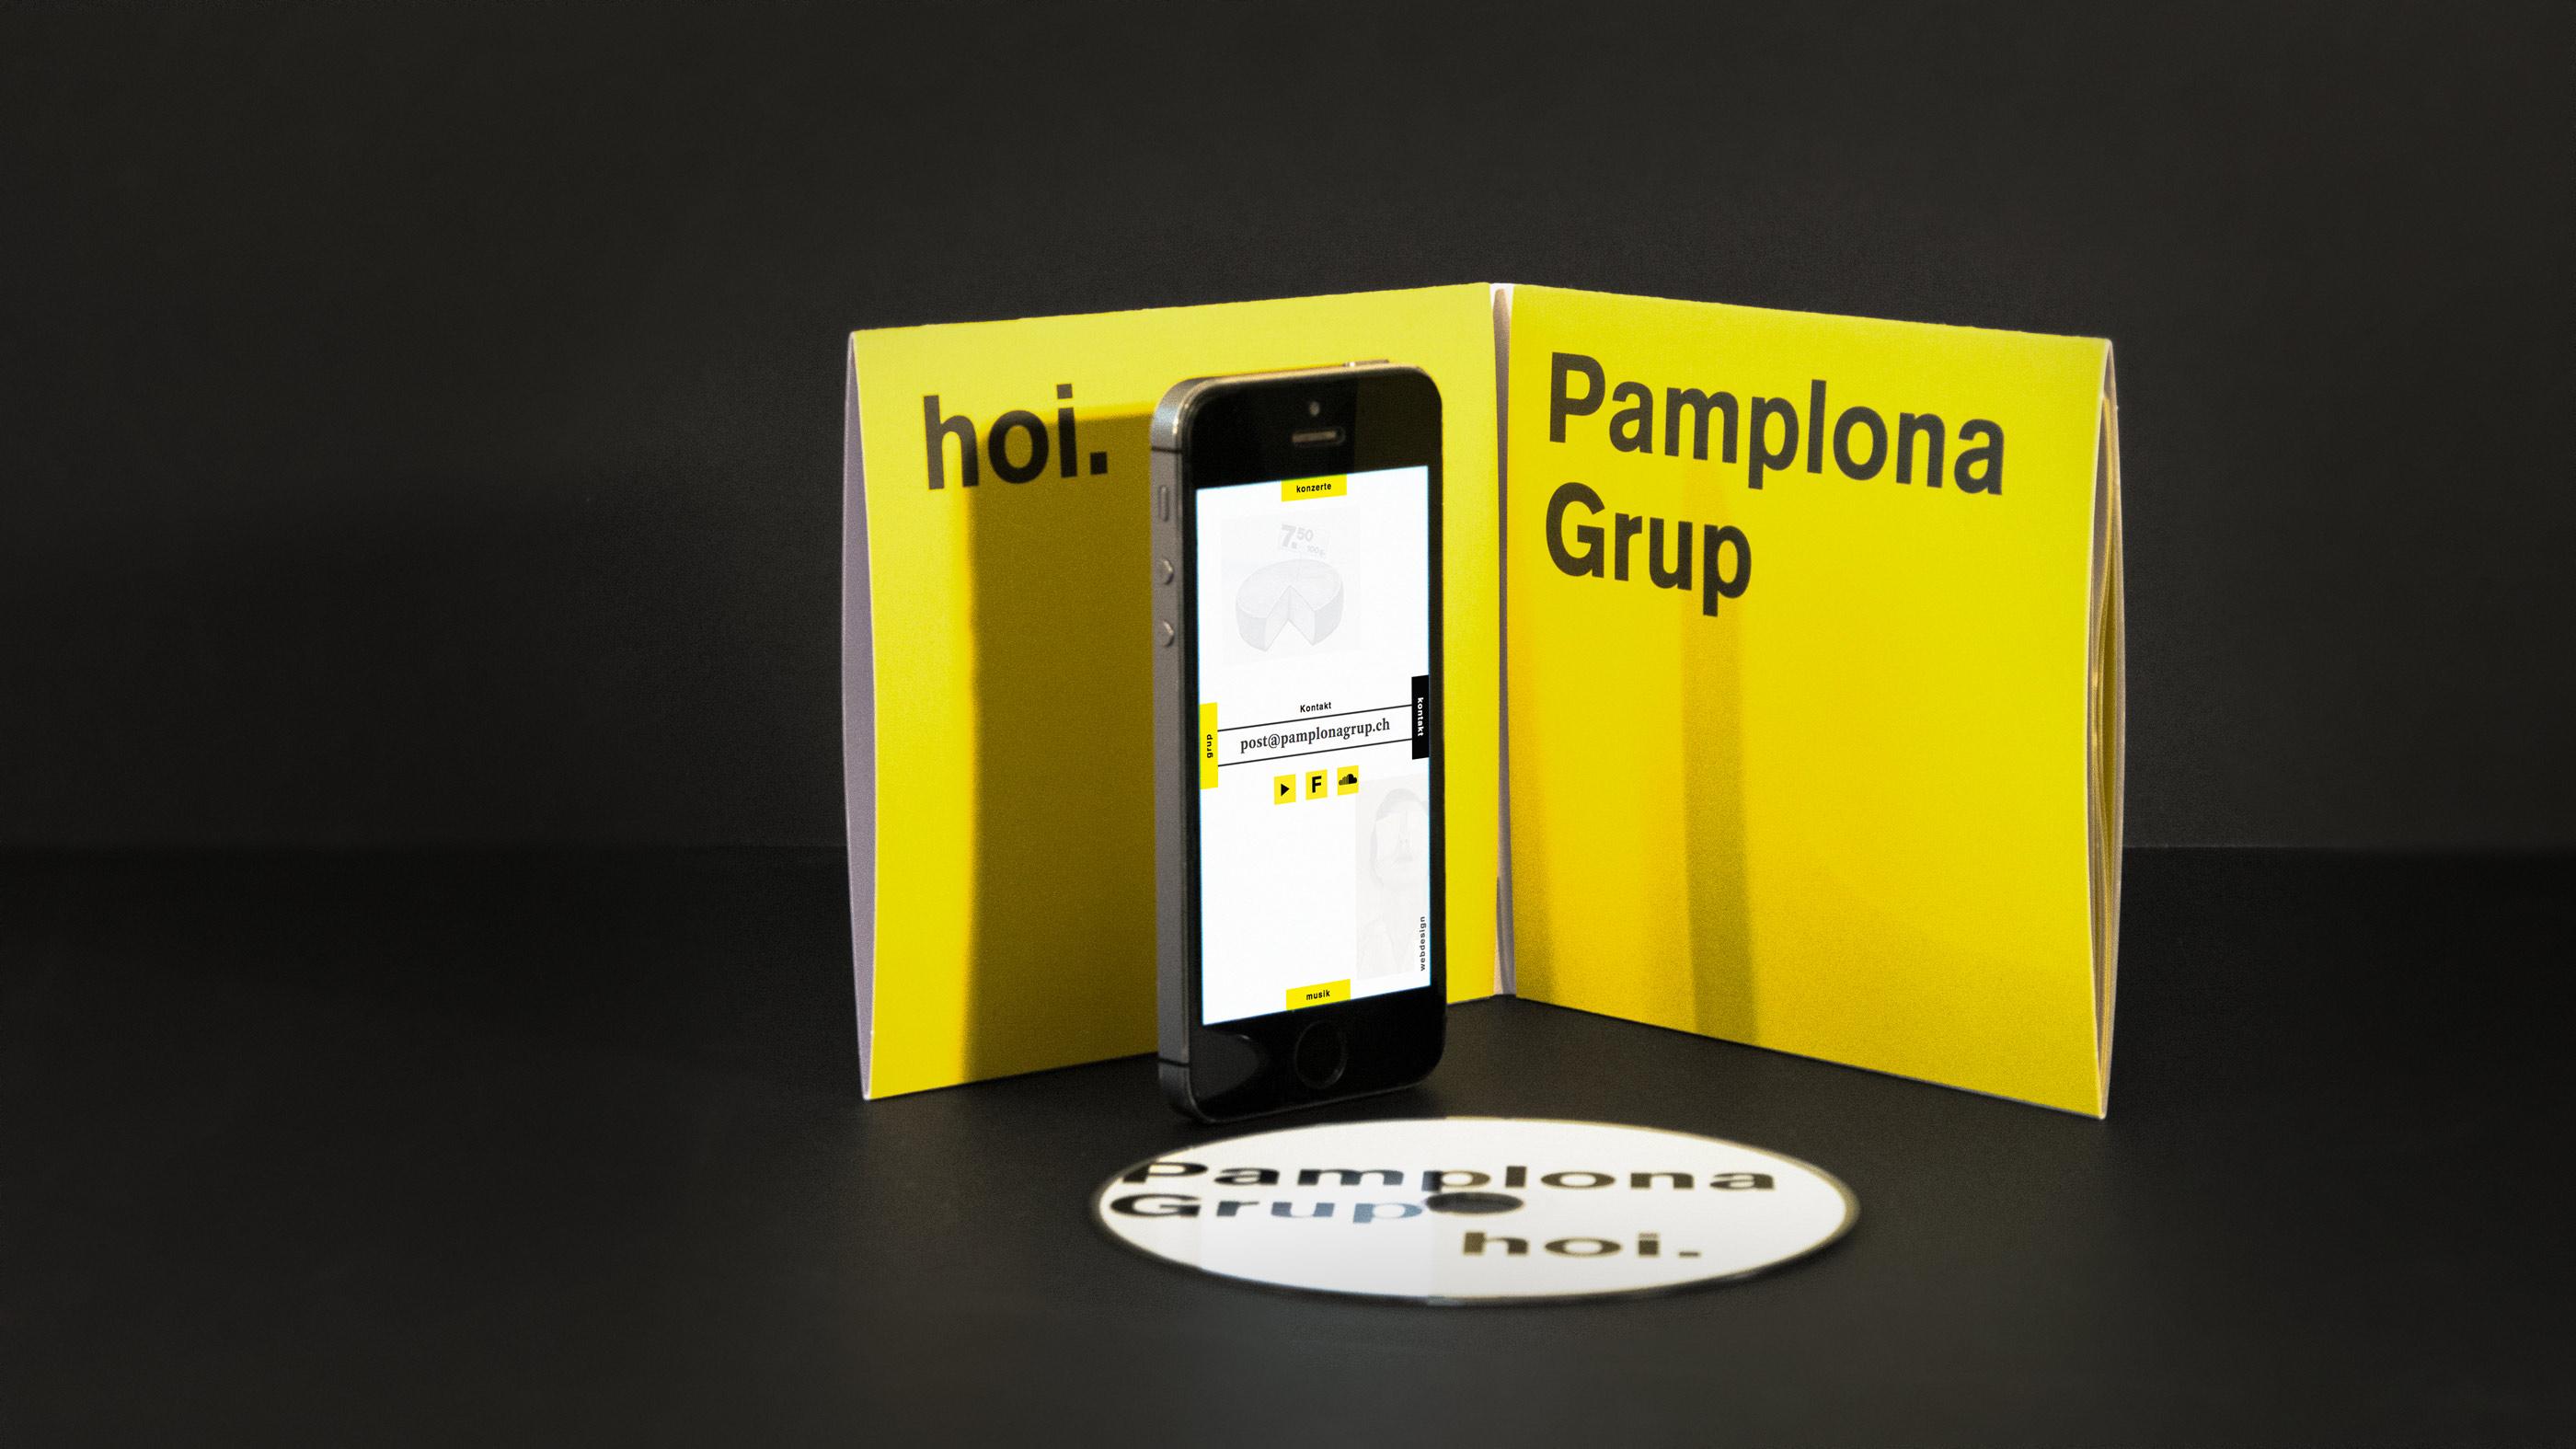 l'équipe [visuelle] – Pamplona Grup – Artwork, Digipack, Plakatgestaltung, Worldmusic, Webdesign, Responsive, Web-Programming, Migros Körbli